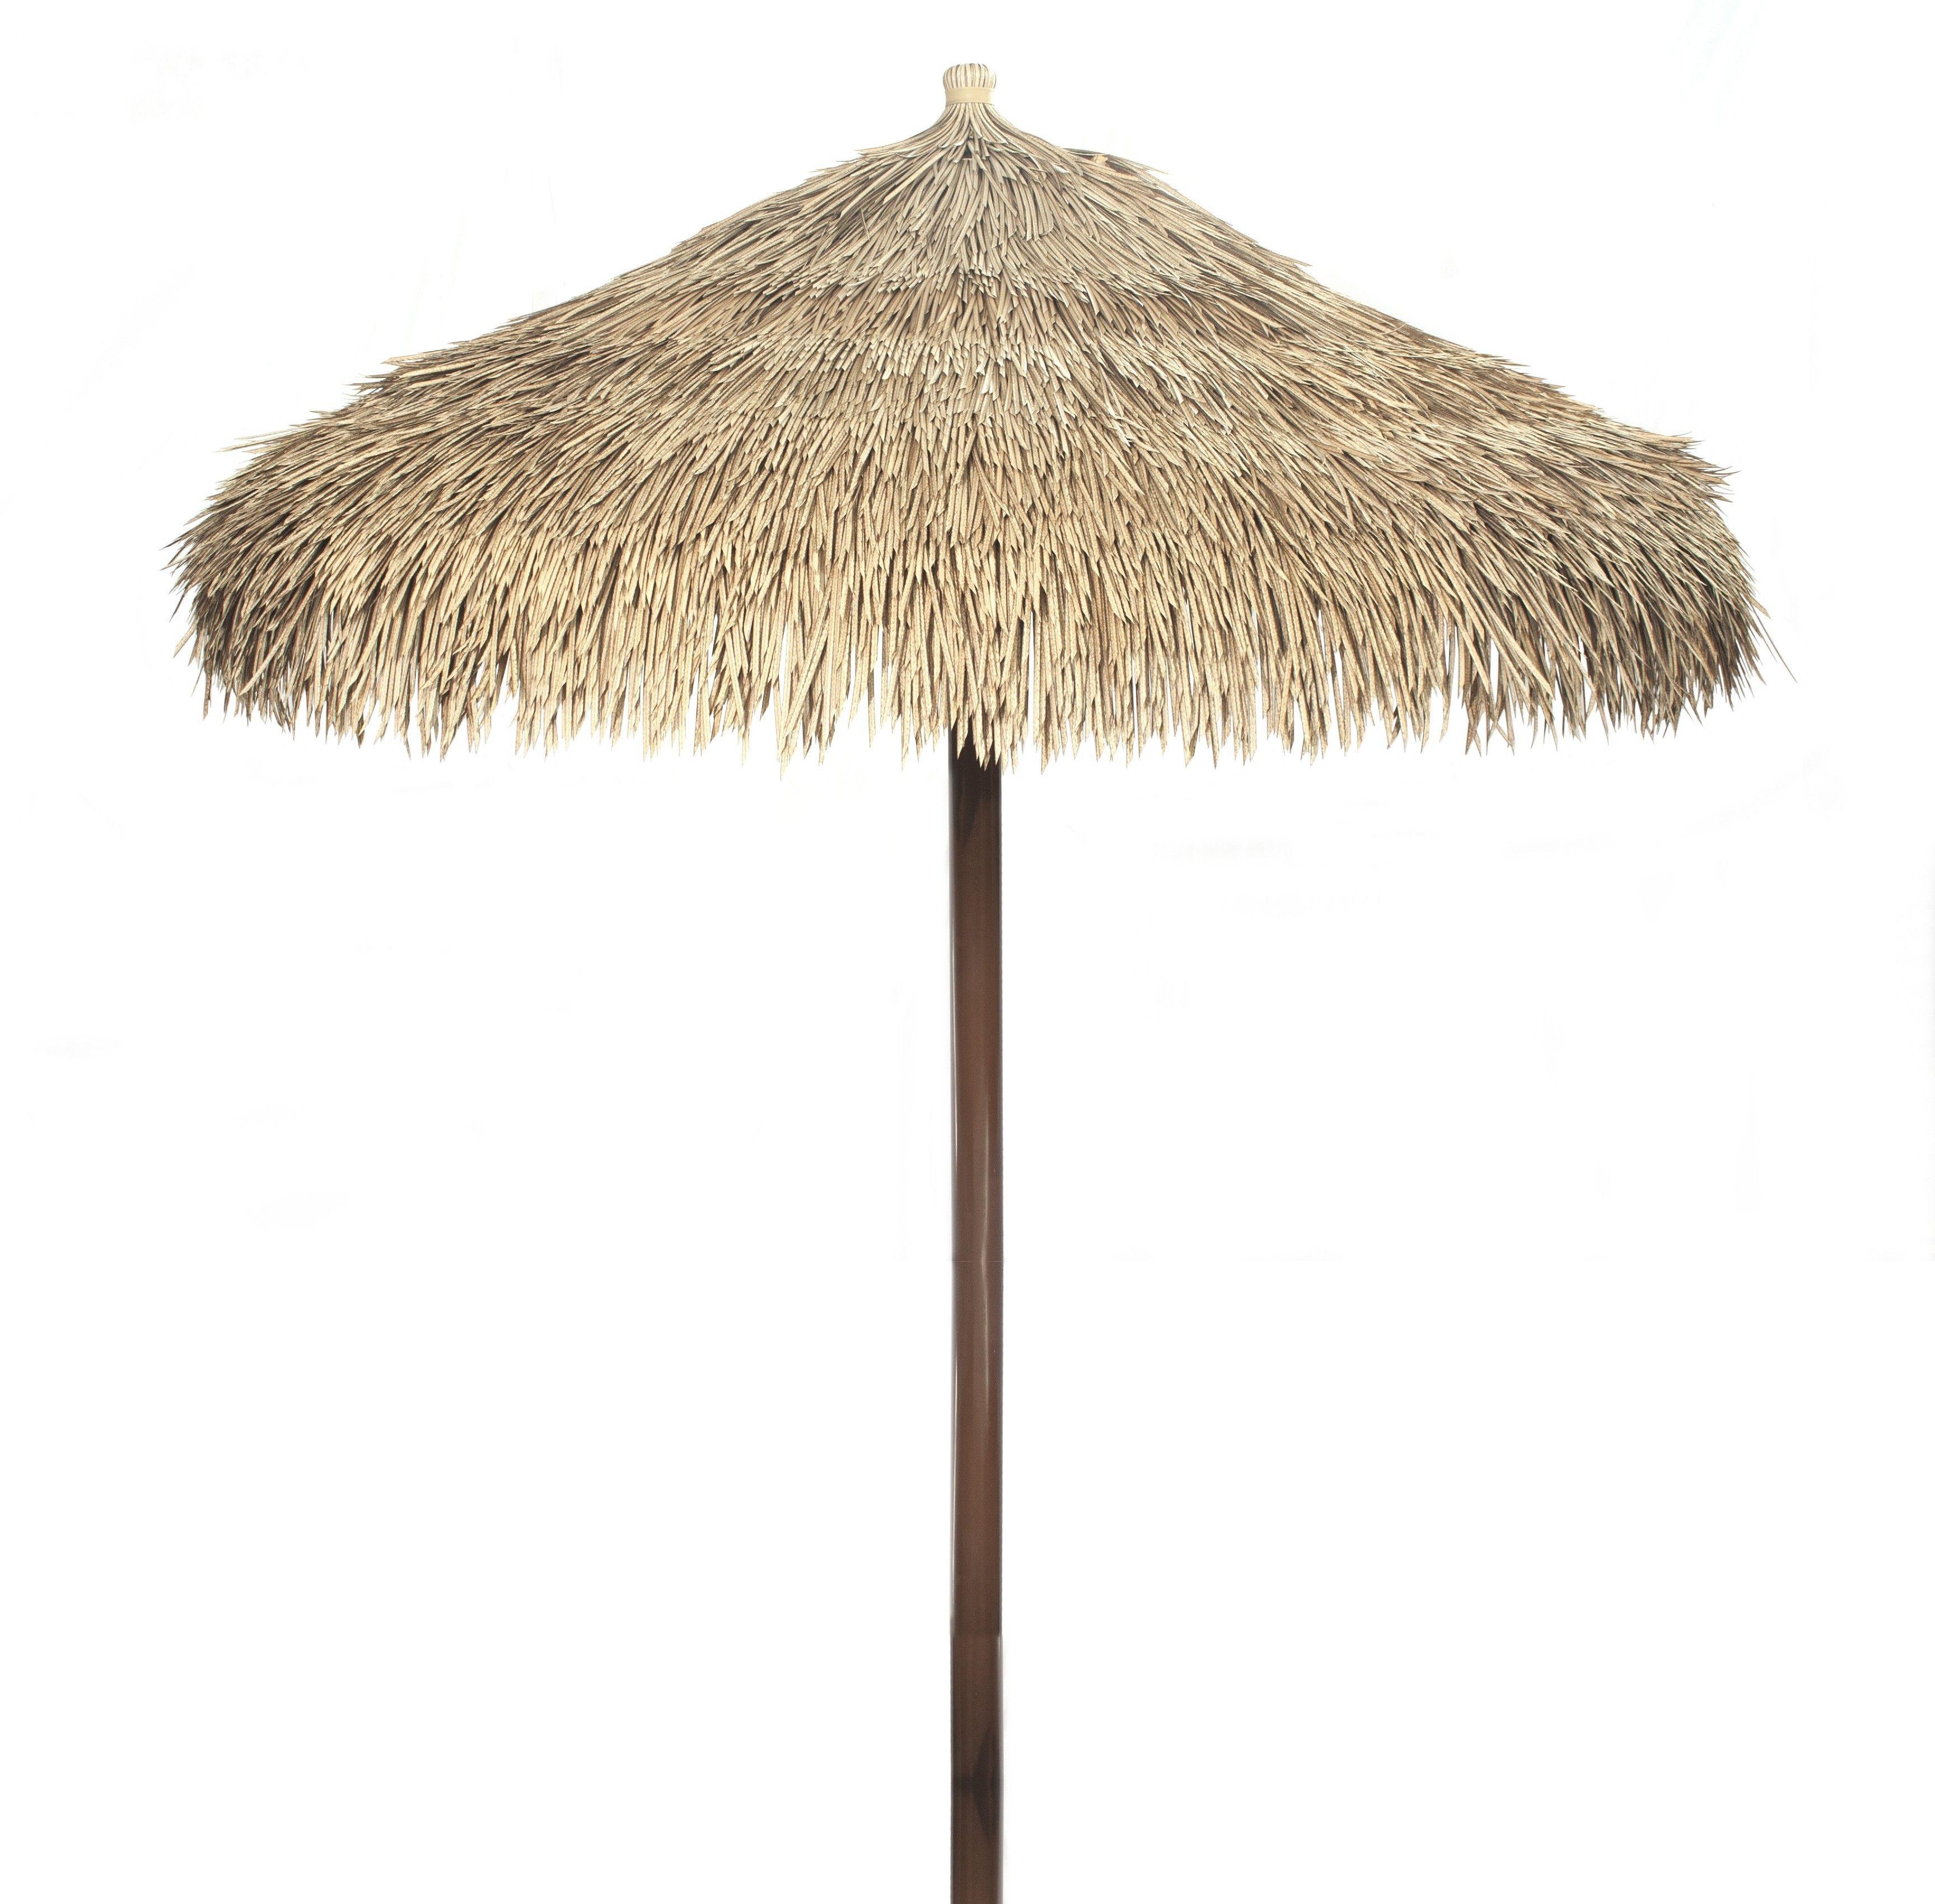 Complete Umbrella Made From Artificial Thatch Viro Java Palm Backyard X Scapes Umbrella Thatch Tiki Umbrella